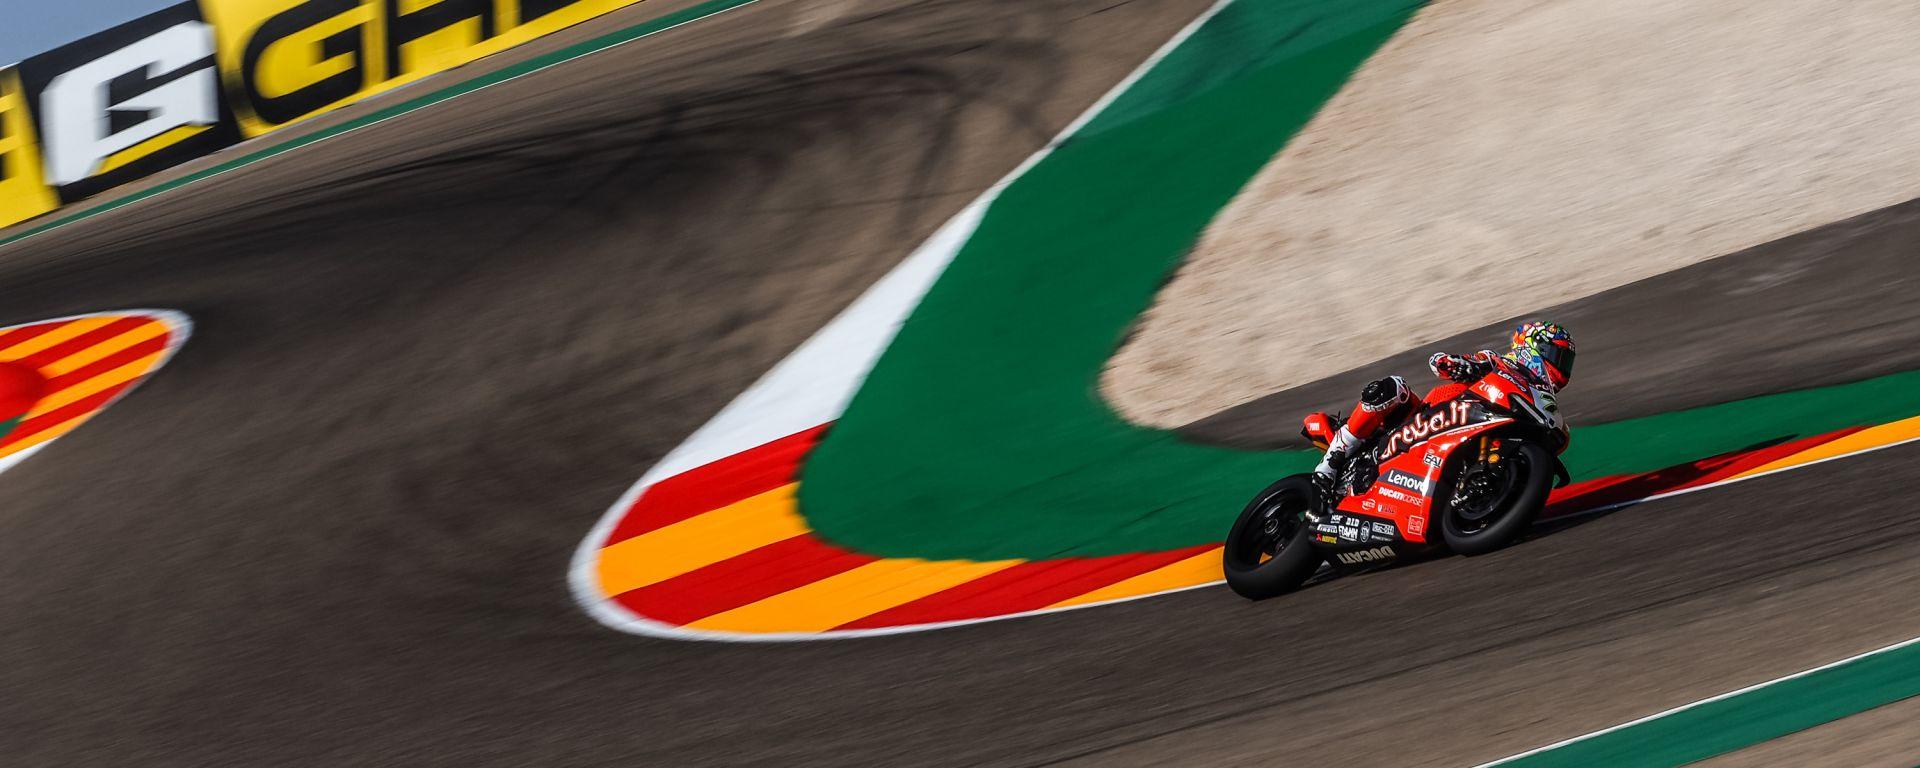 WorldSBK Round Aragon 1, Alcaniz: Michael Chaz Davies (Ducati)